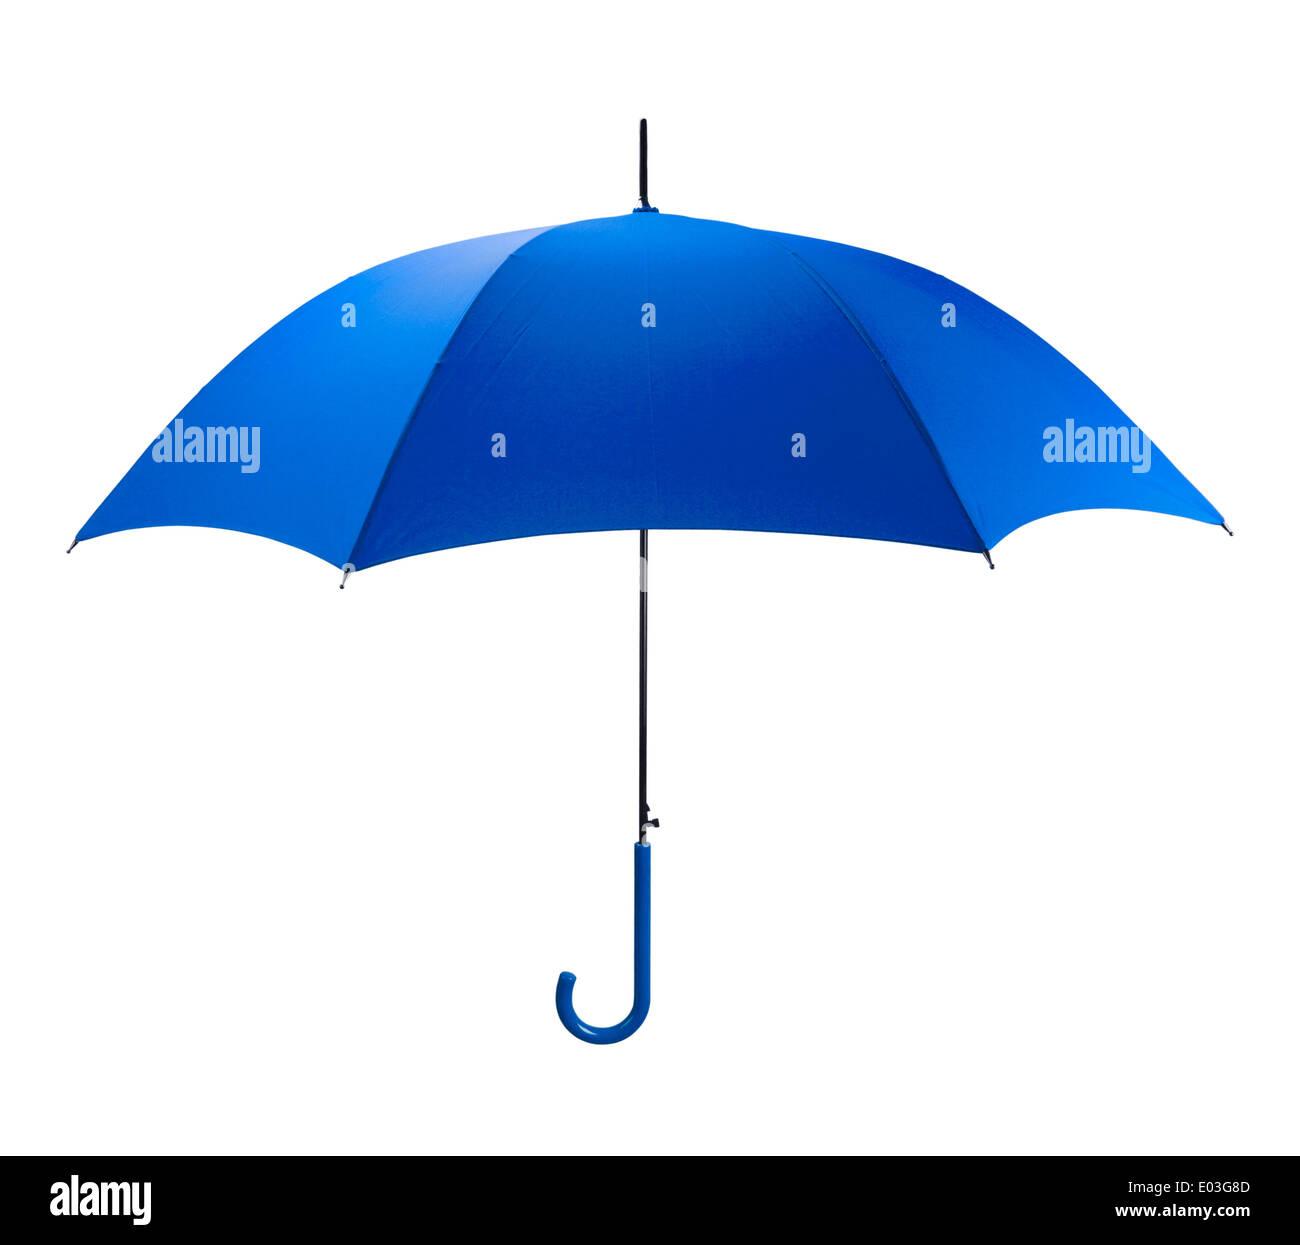 Helle blaue Regenschirm Seitenansicht, Isolated on White Background. Stockbild